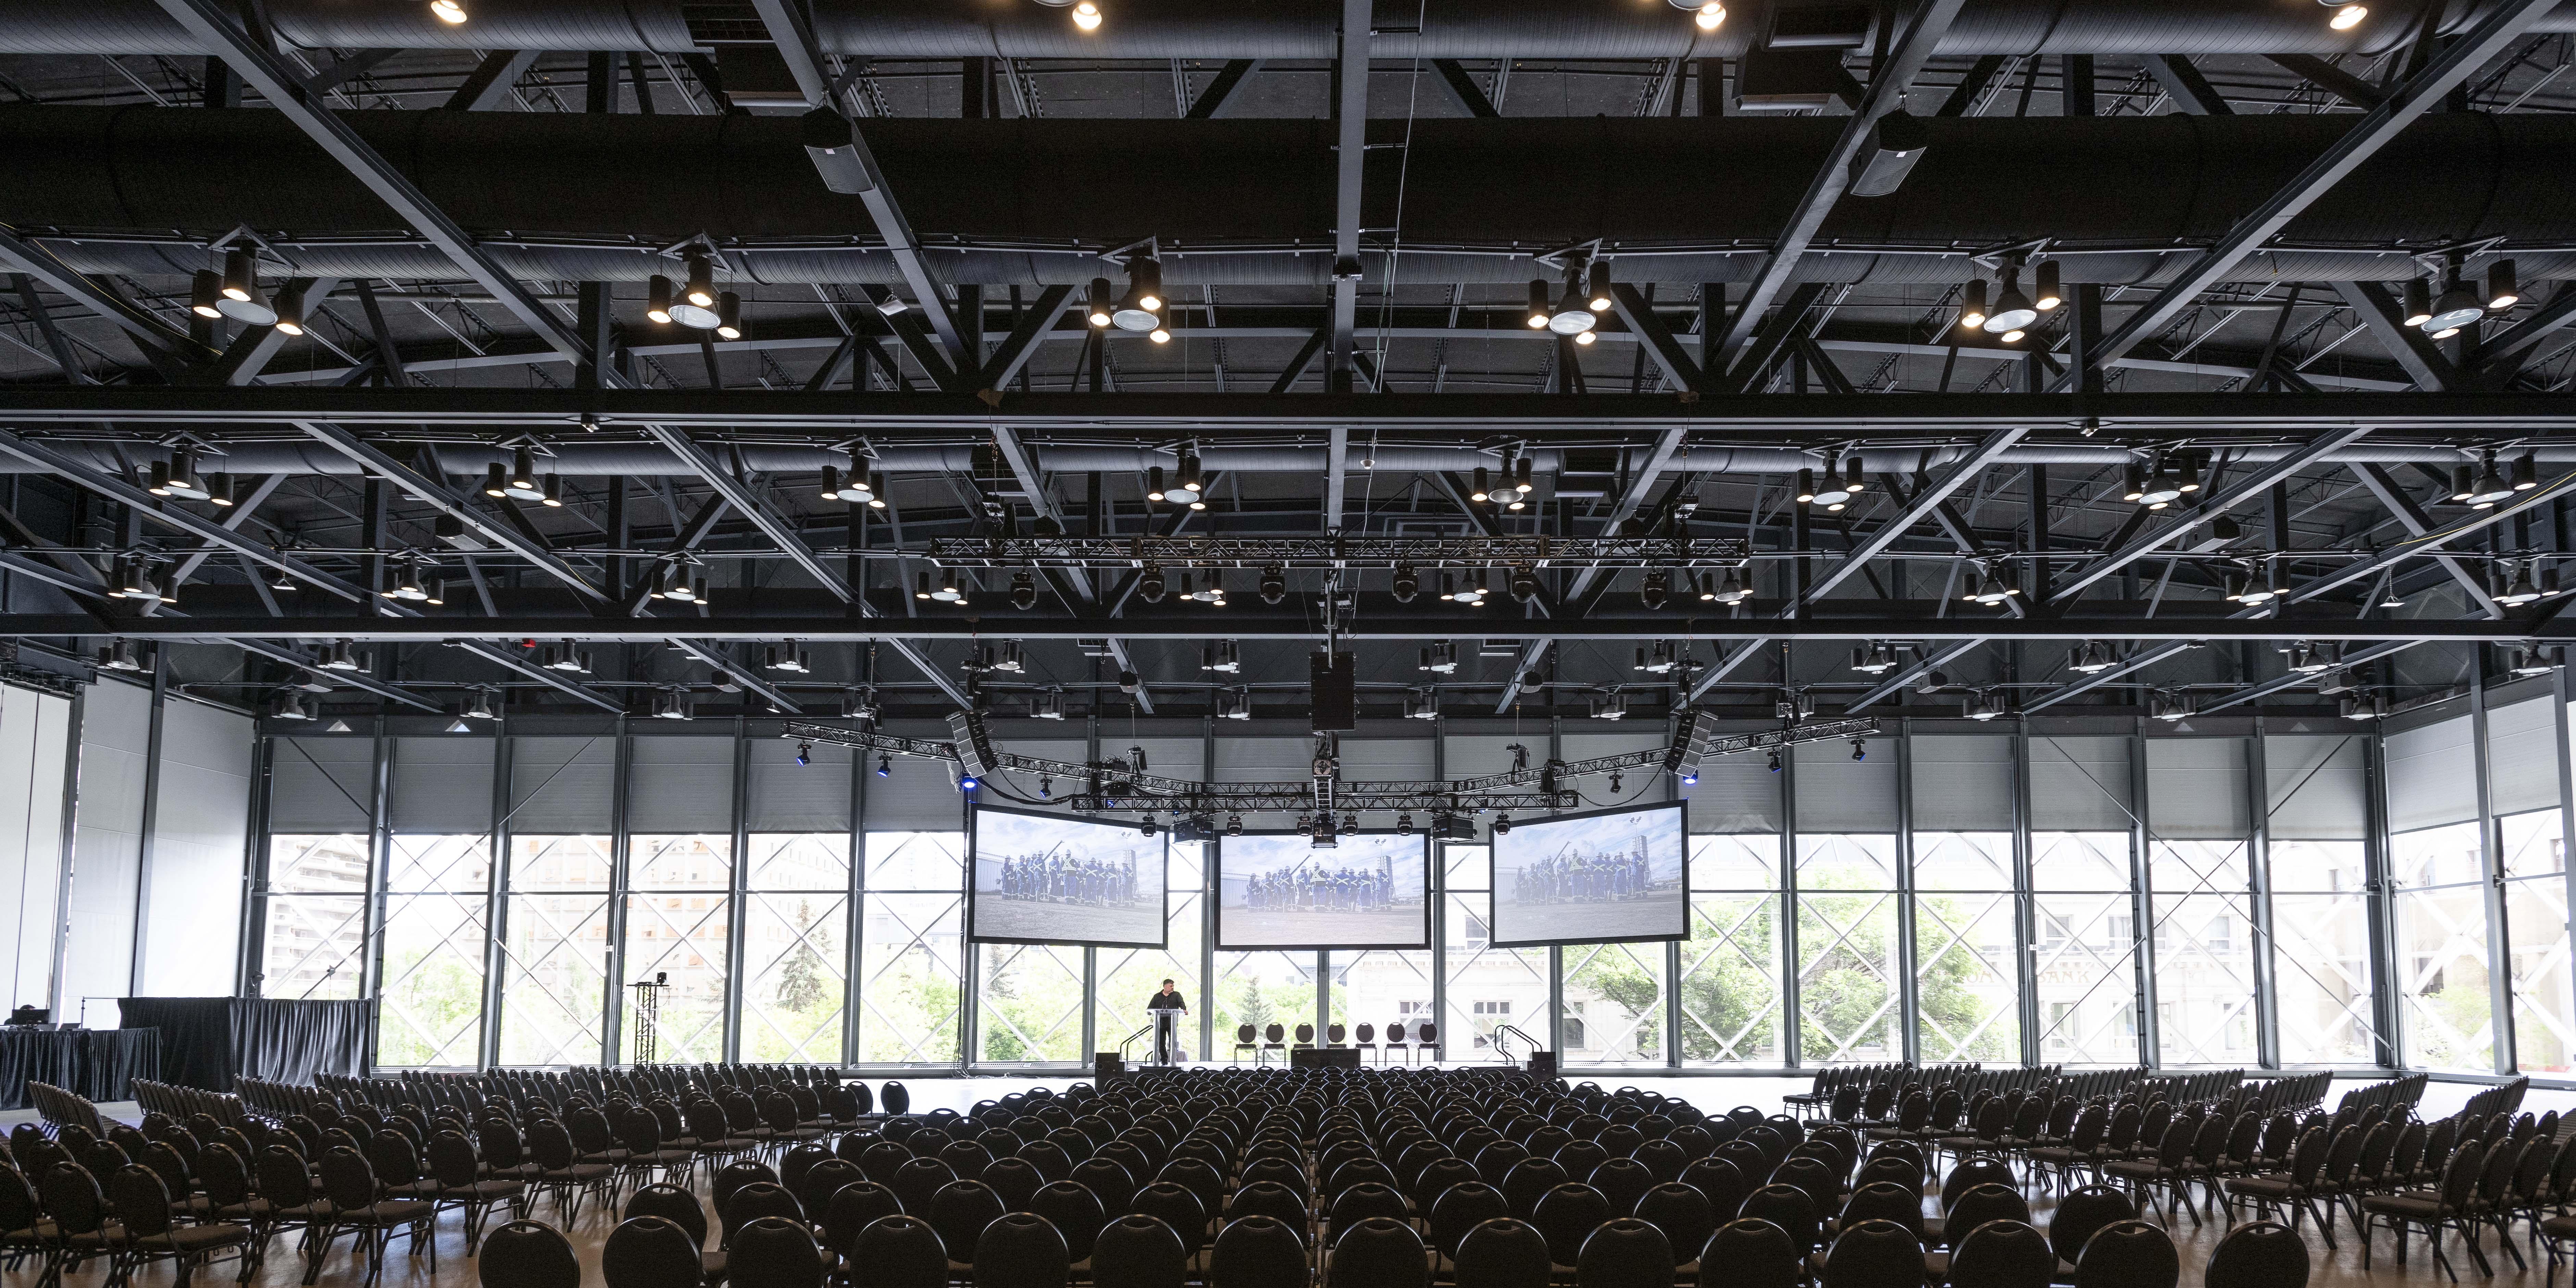 Calgary TELUS Convention Centre announces partnership with Superior Show Service